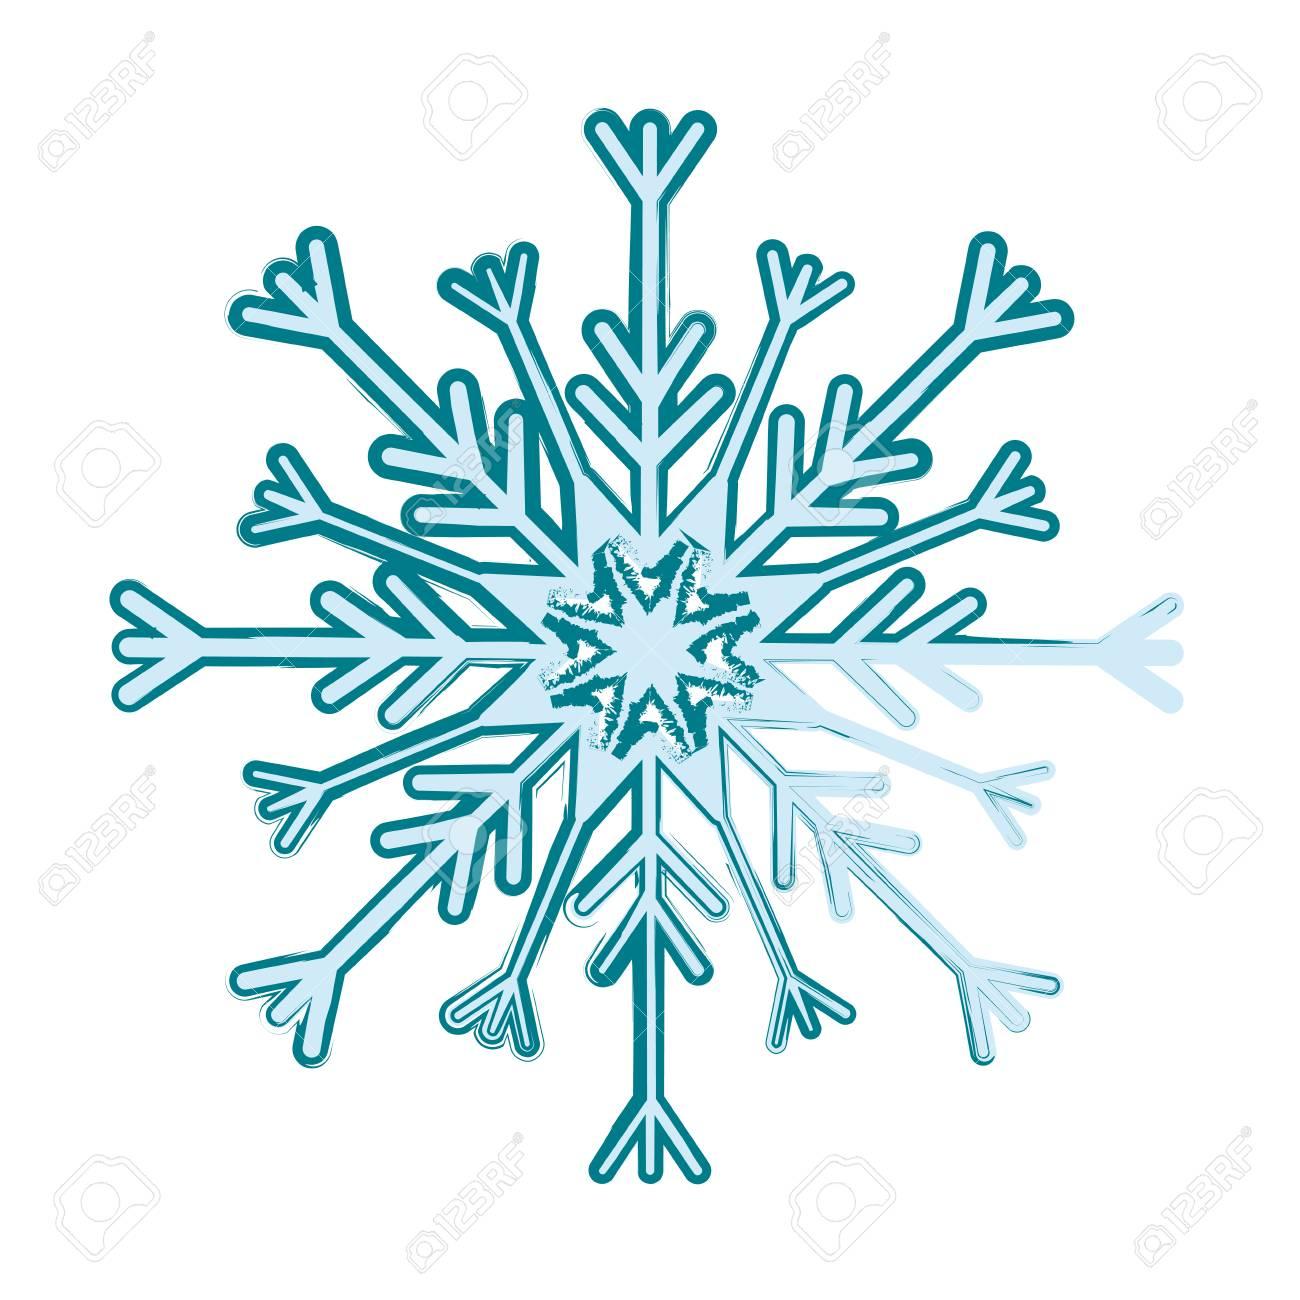 snowflake winter snow icon vector illustration graphic design rh 123rf com vector snowflakes free download vector snowflakes free download